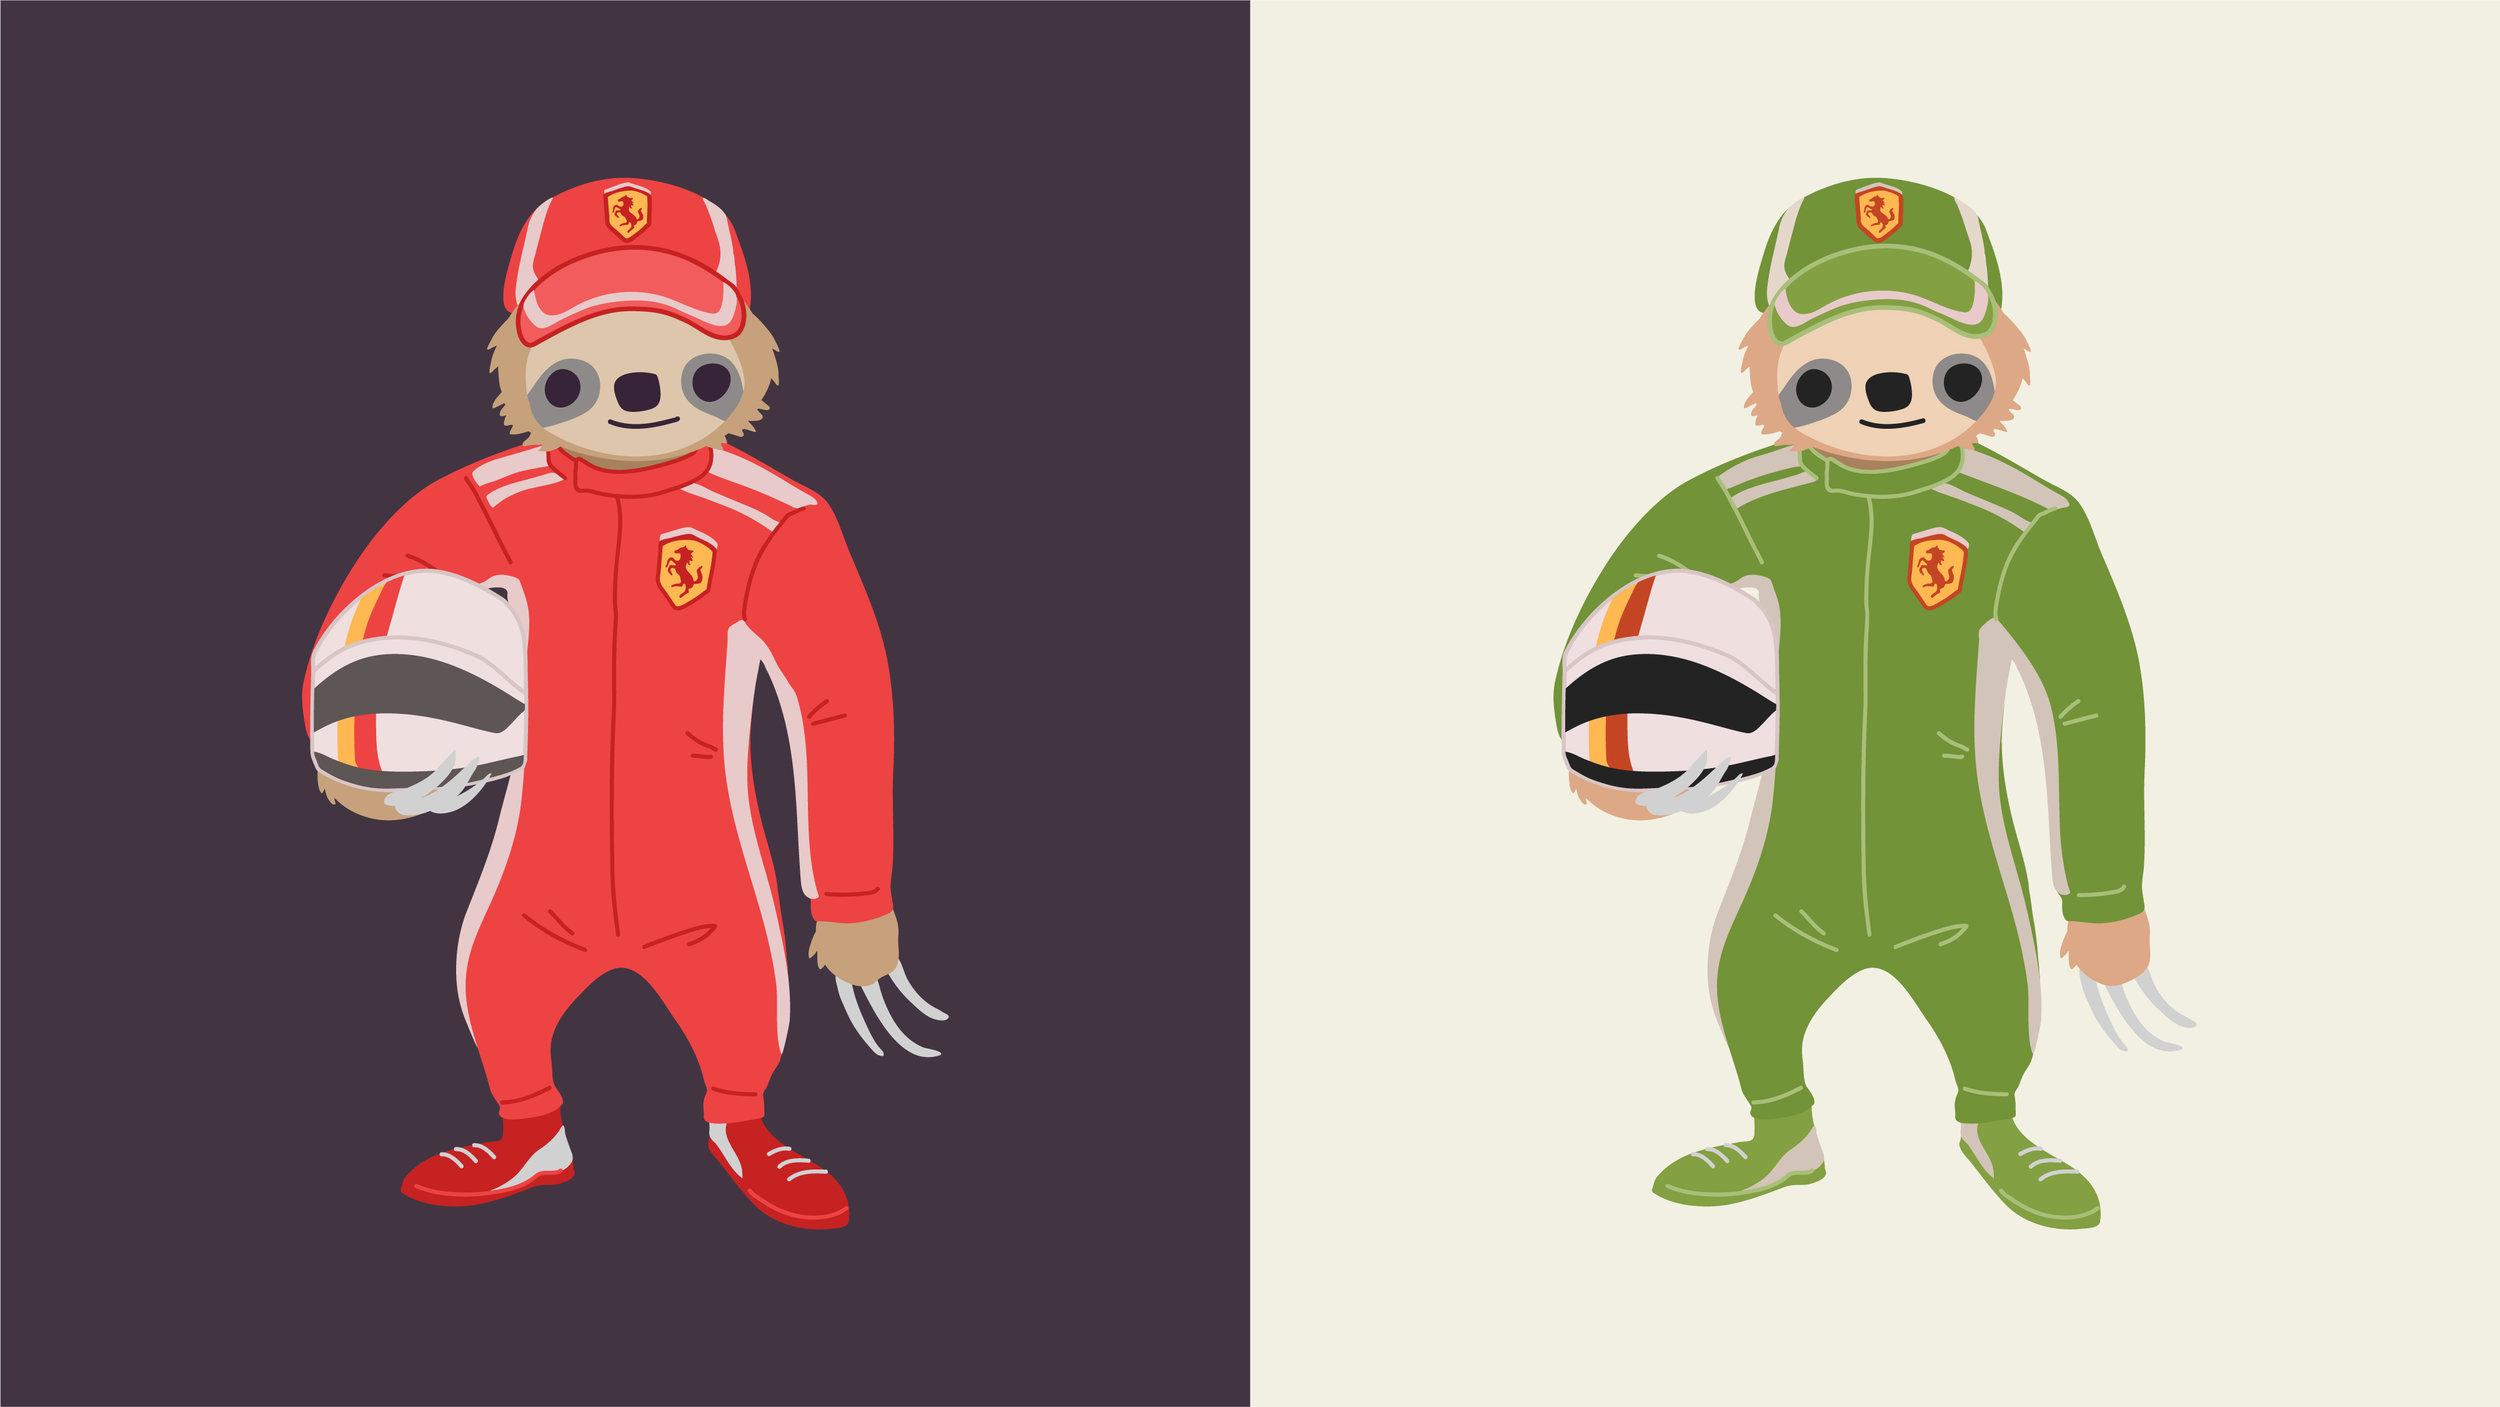 Formula 1 Racing Sloth — Follow your dreams!